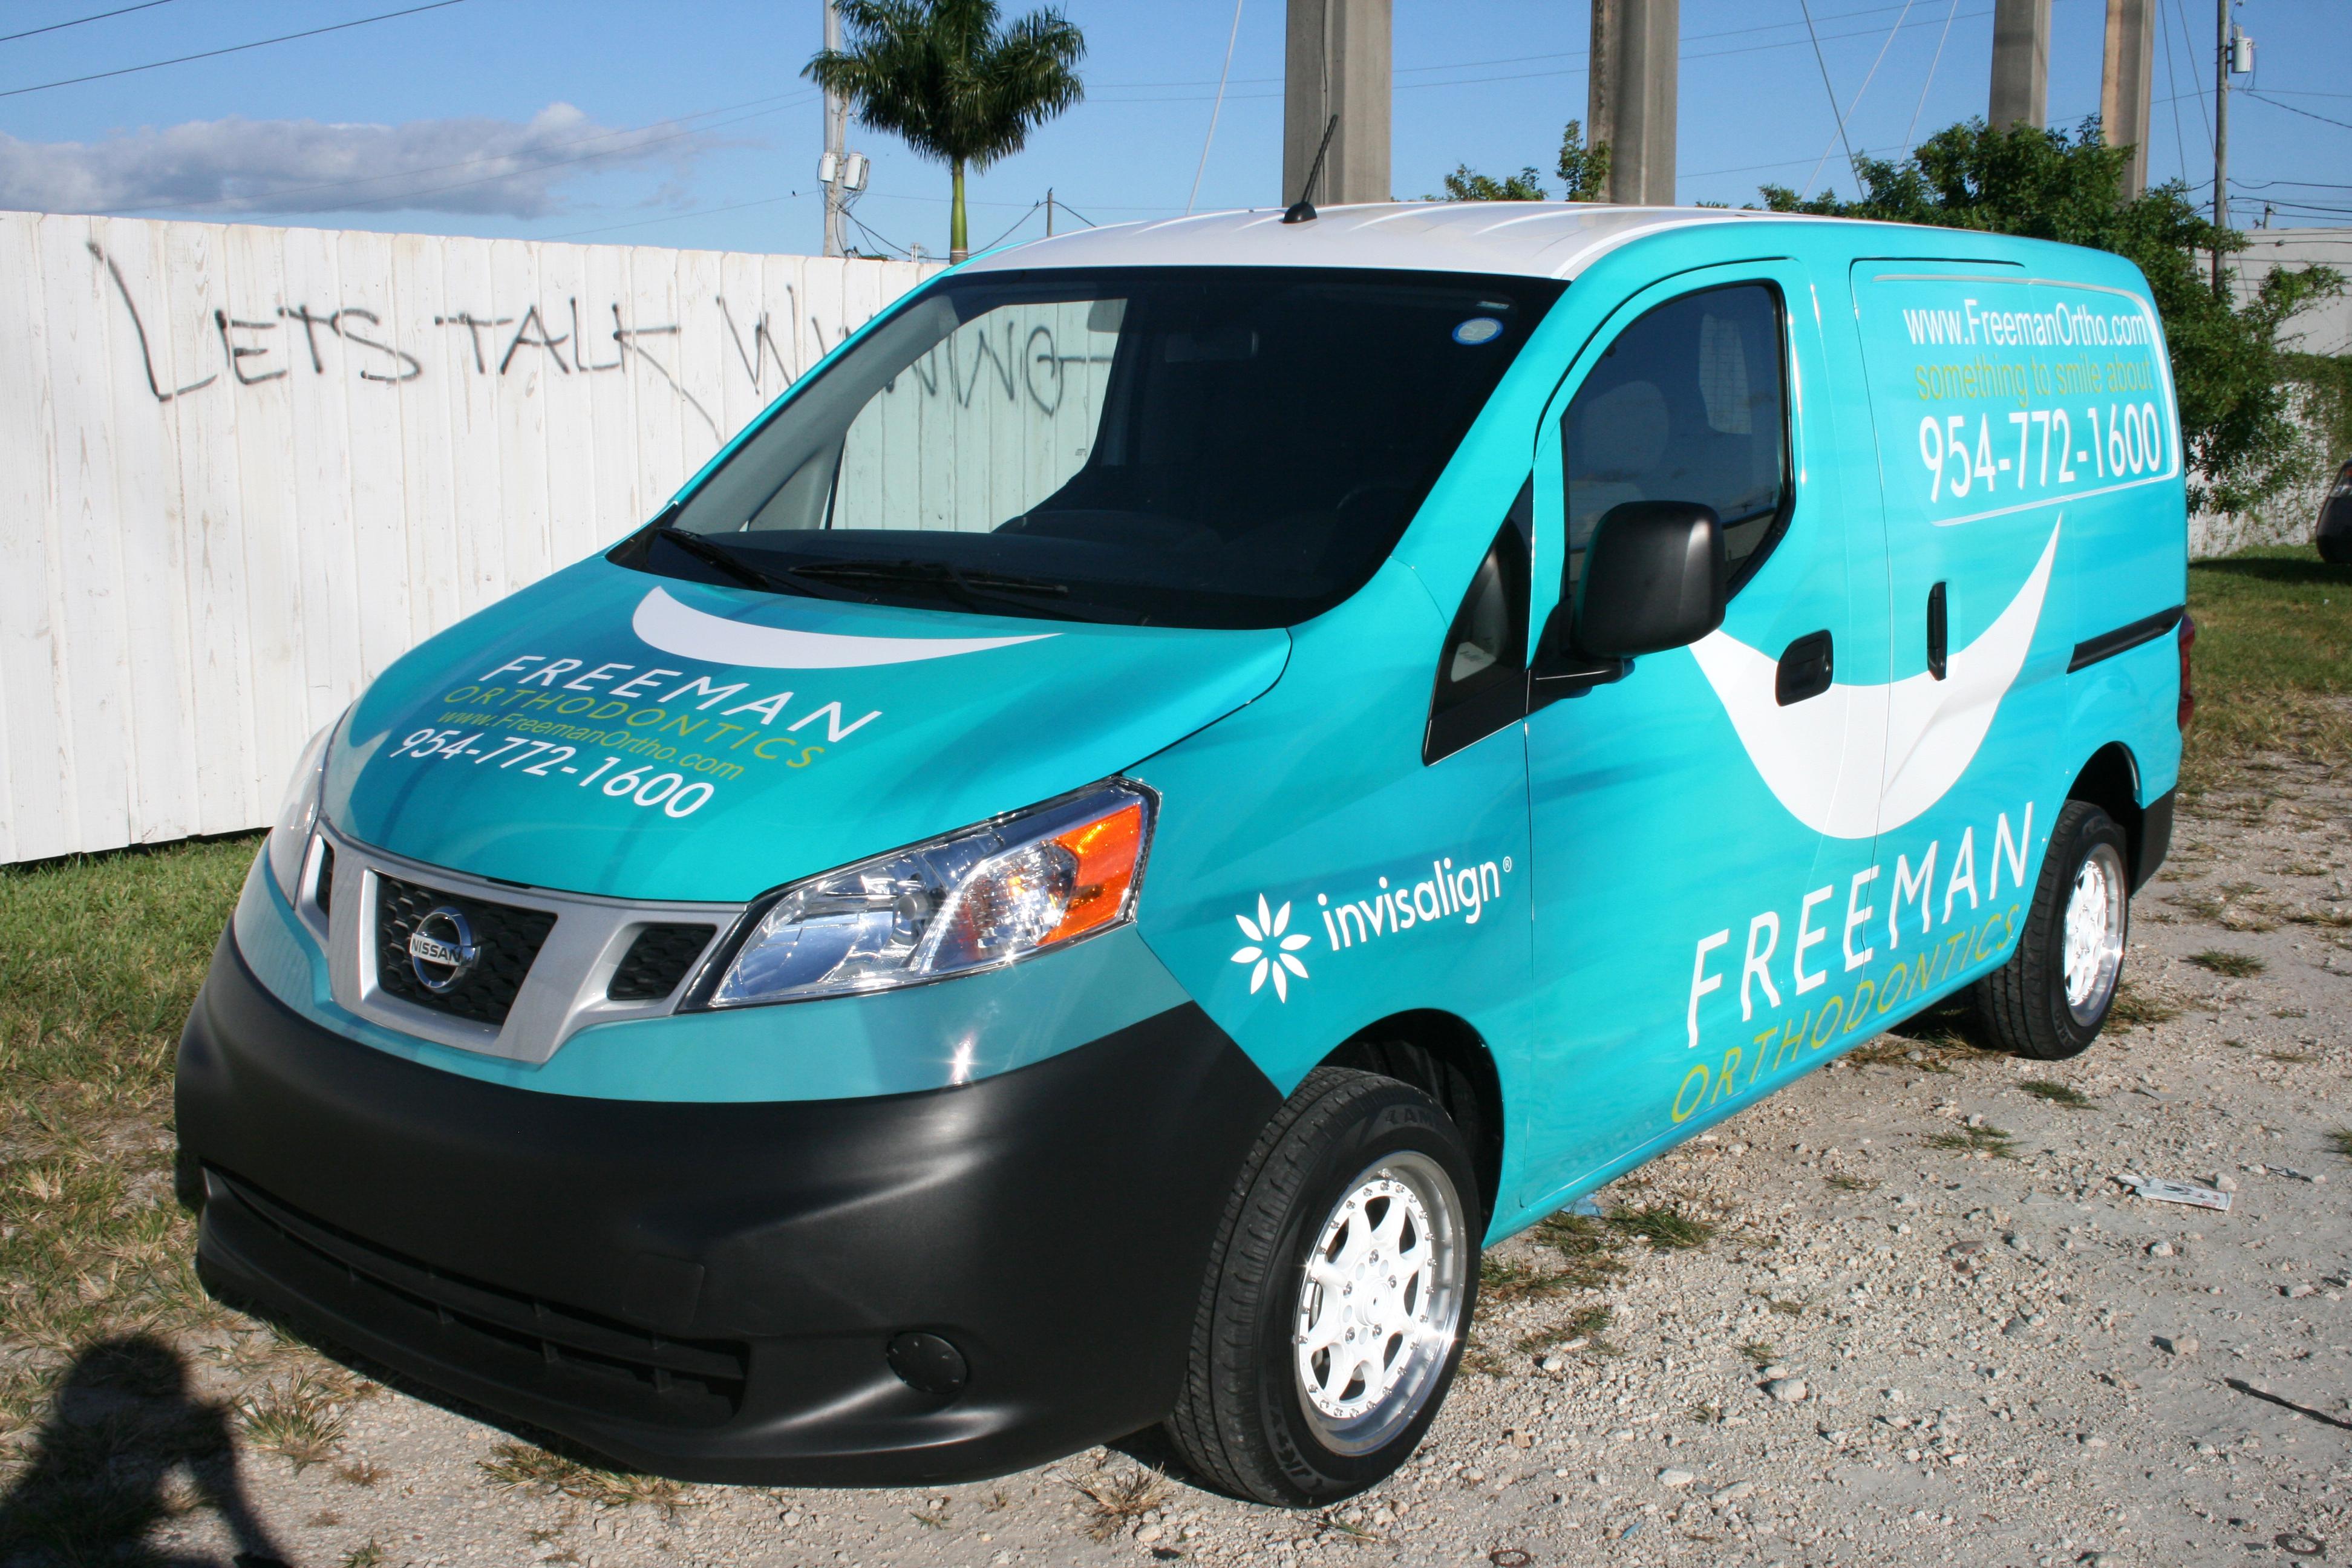 fort lauderdale nissan nv 200 van vehicle wrap advertising marketing. Black Bedroom Furniture Sets. Home Design Ideas